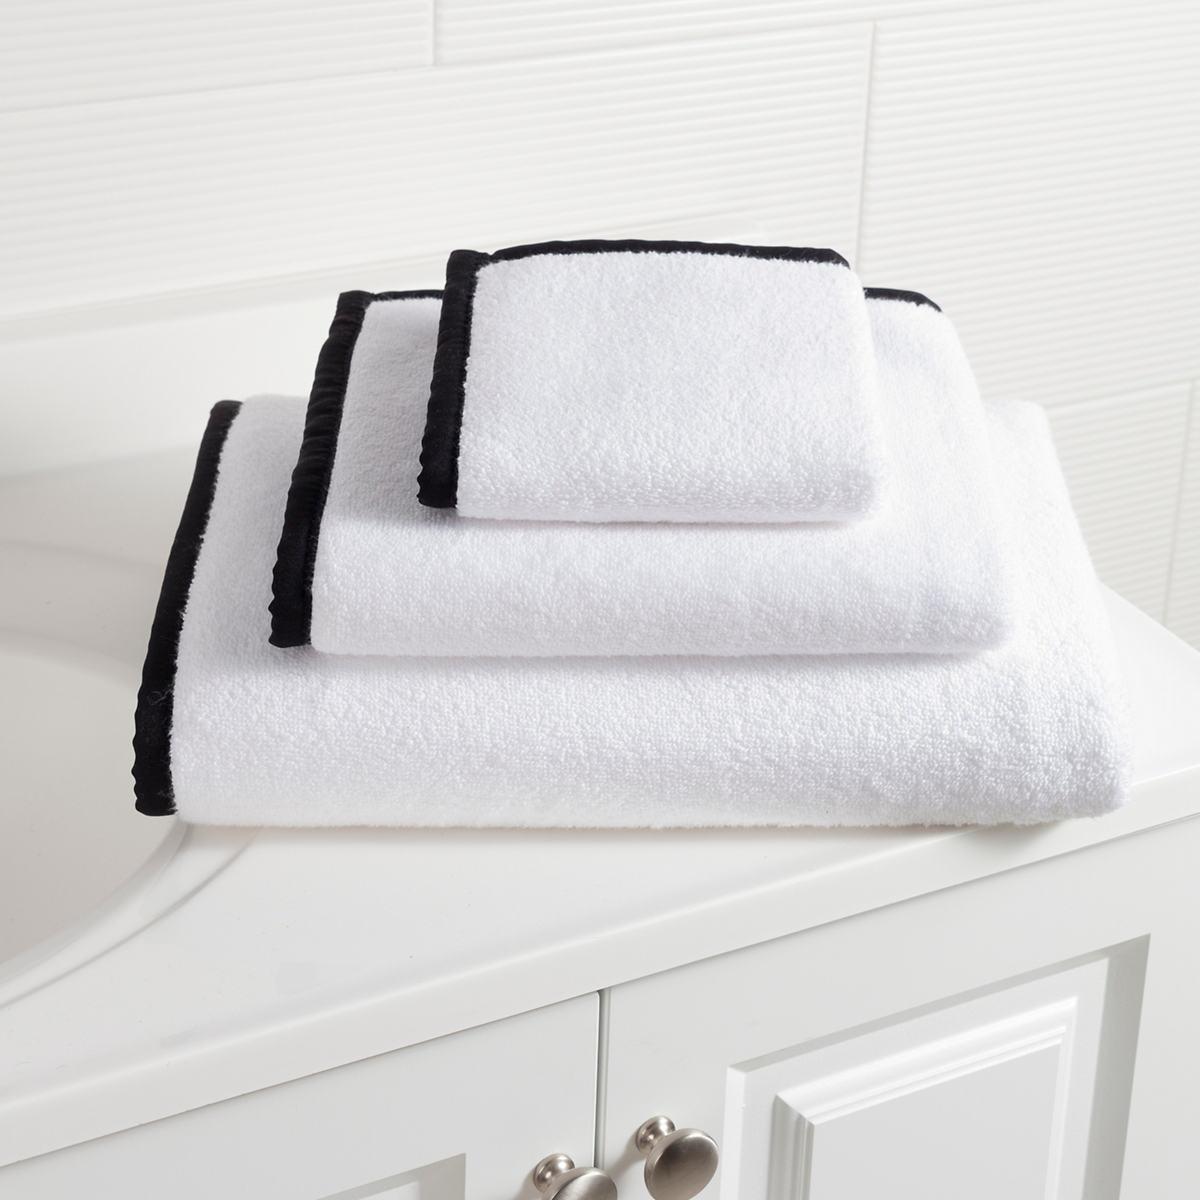 Signature Banded White/Black Towel